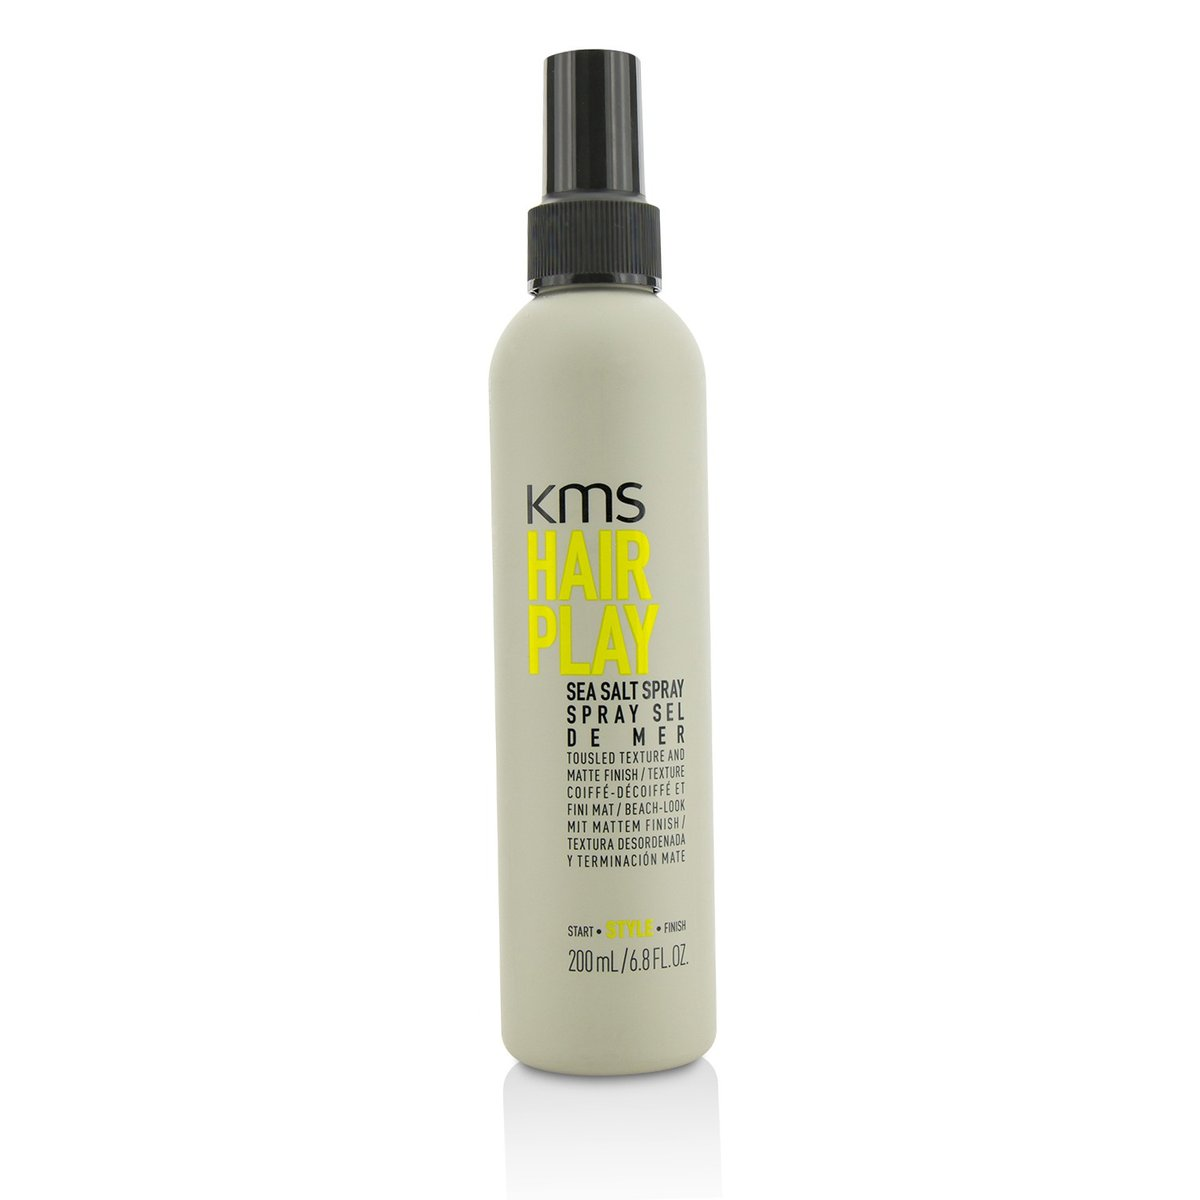 KMS California | Hair Play Sea Salt Spray (Tousled Texture and Matte Finish) | 香港電視 HKTVmall 網上購物